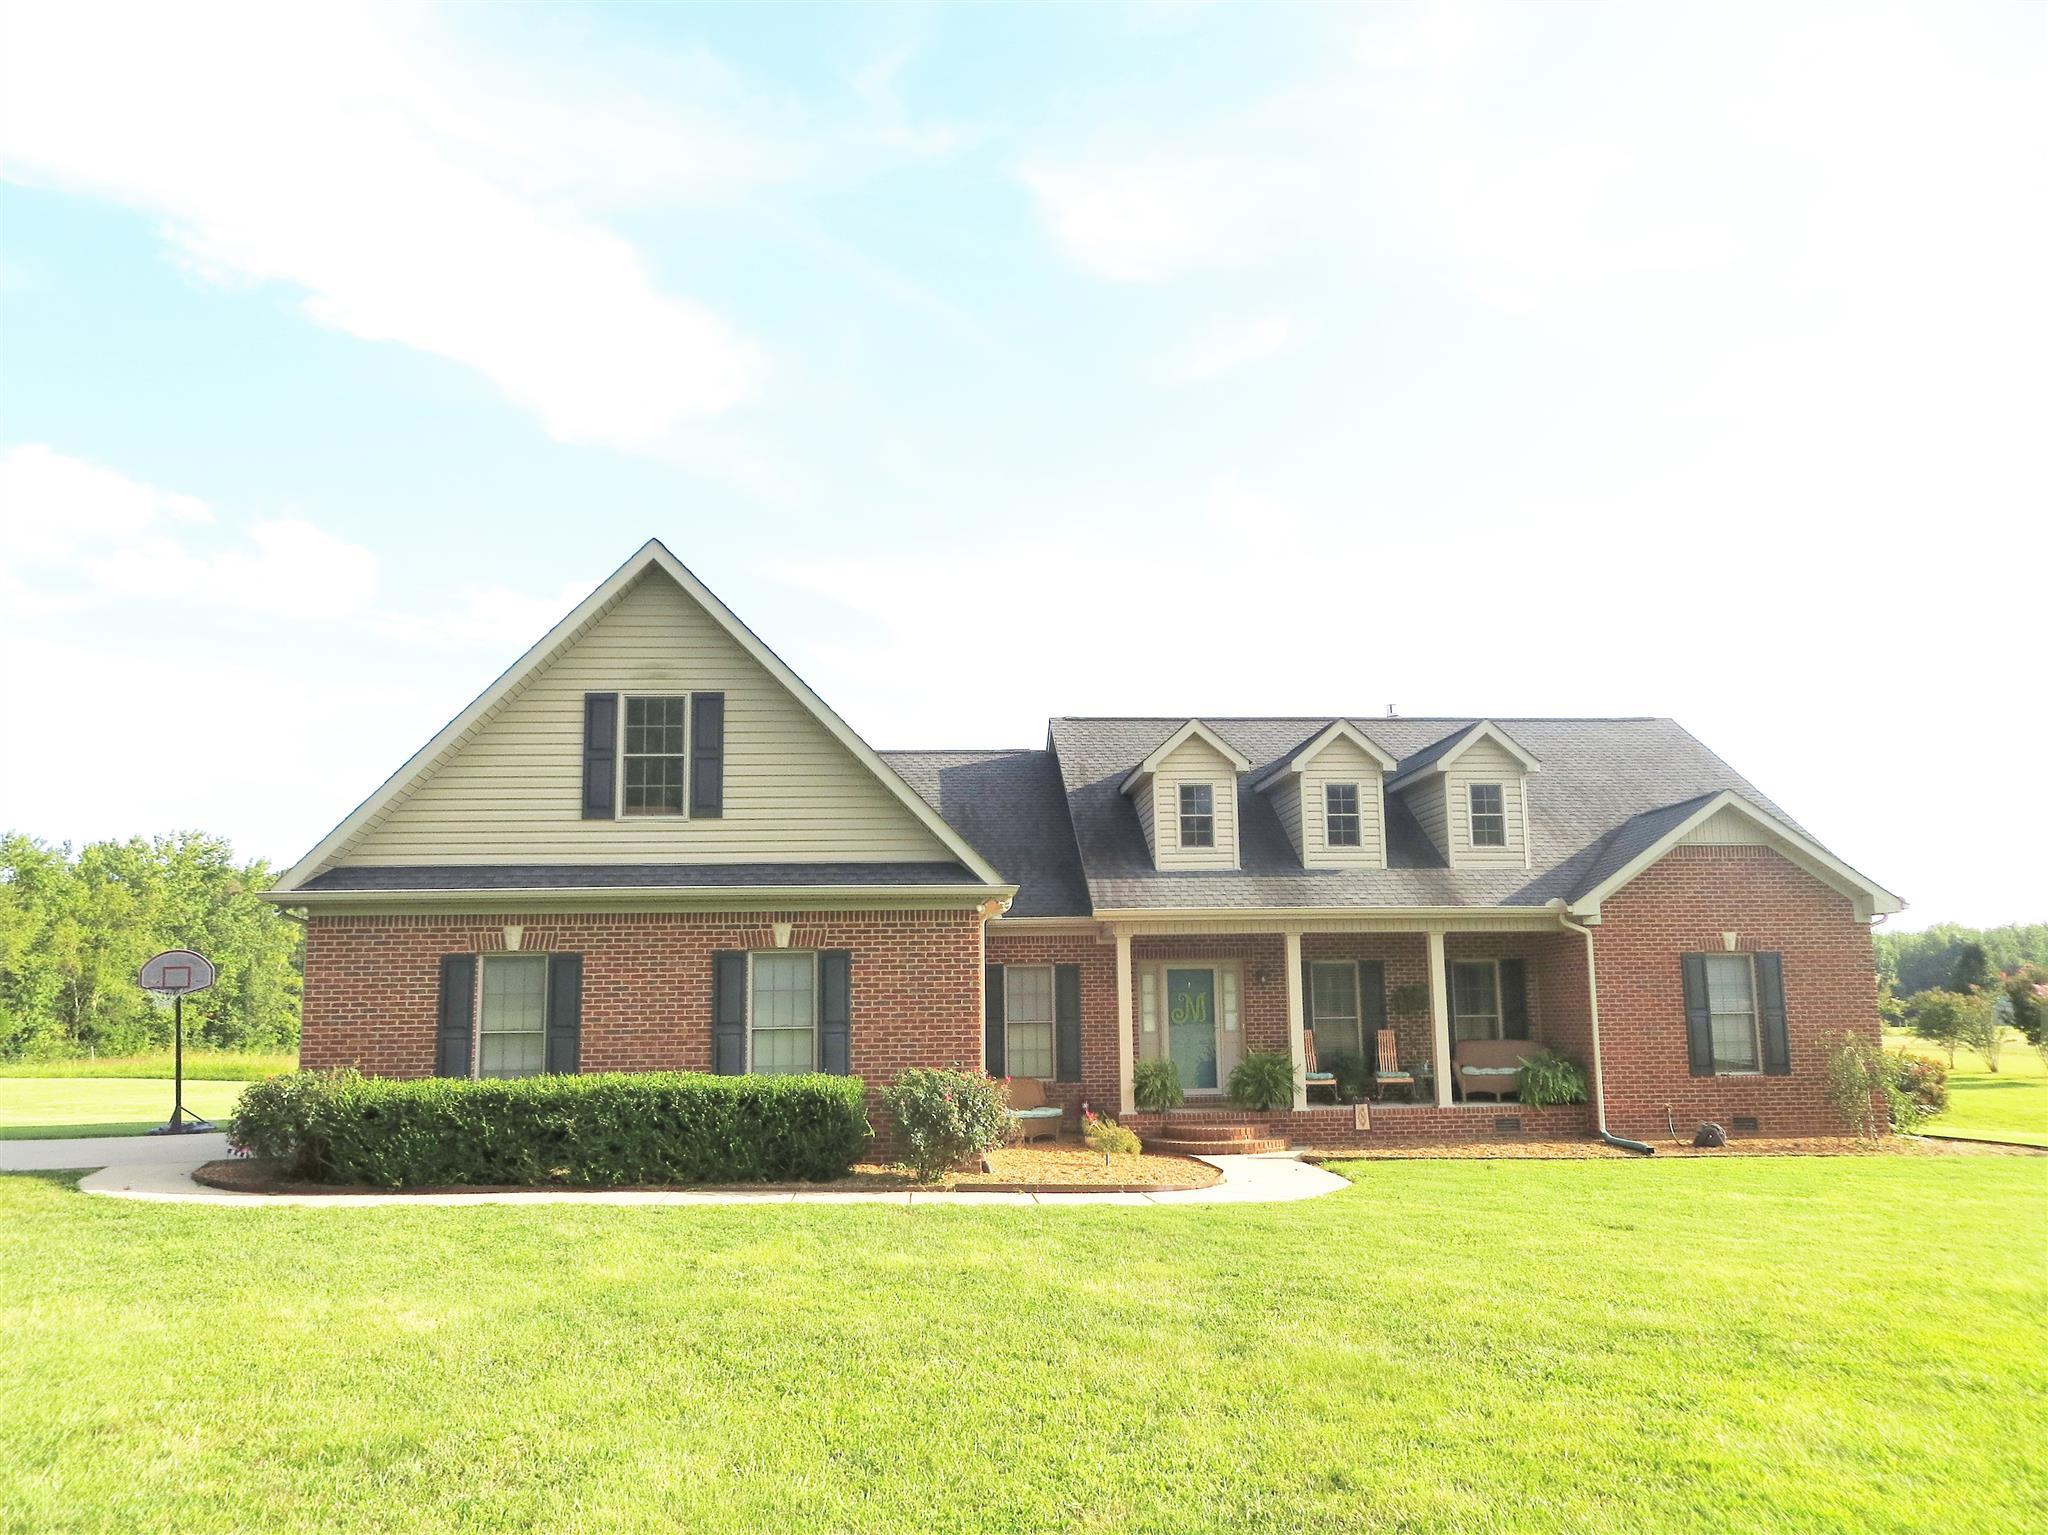 142 Camargo Rd, Fayetteville, TN 37334